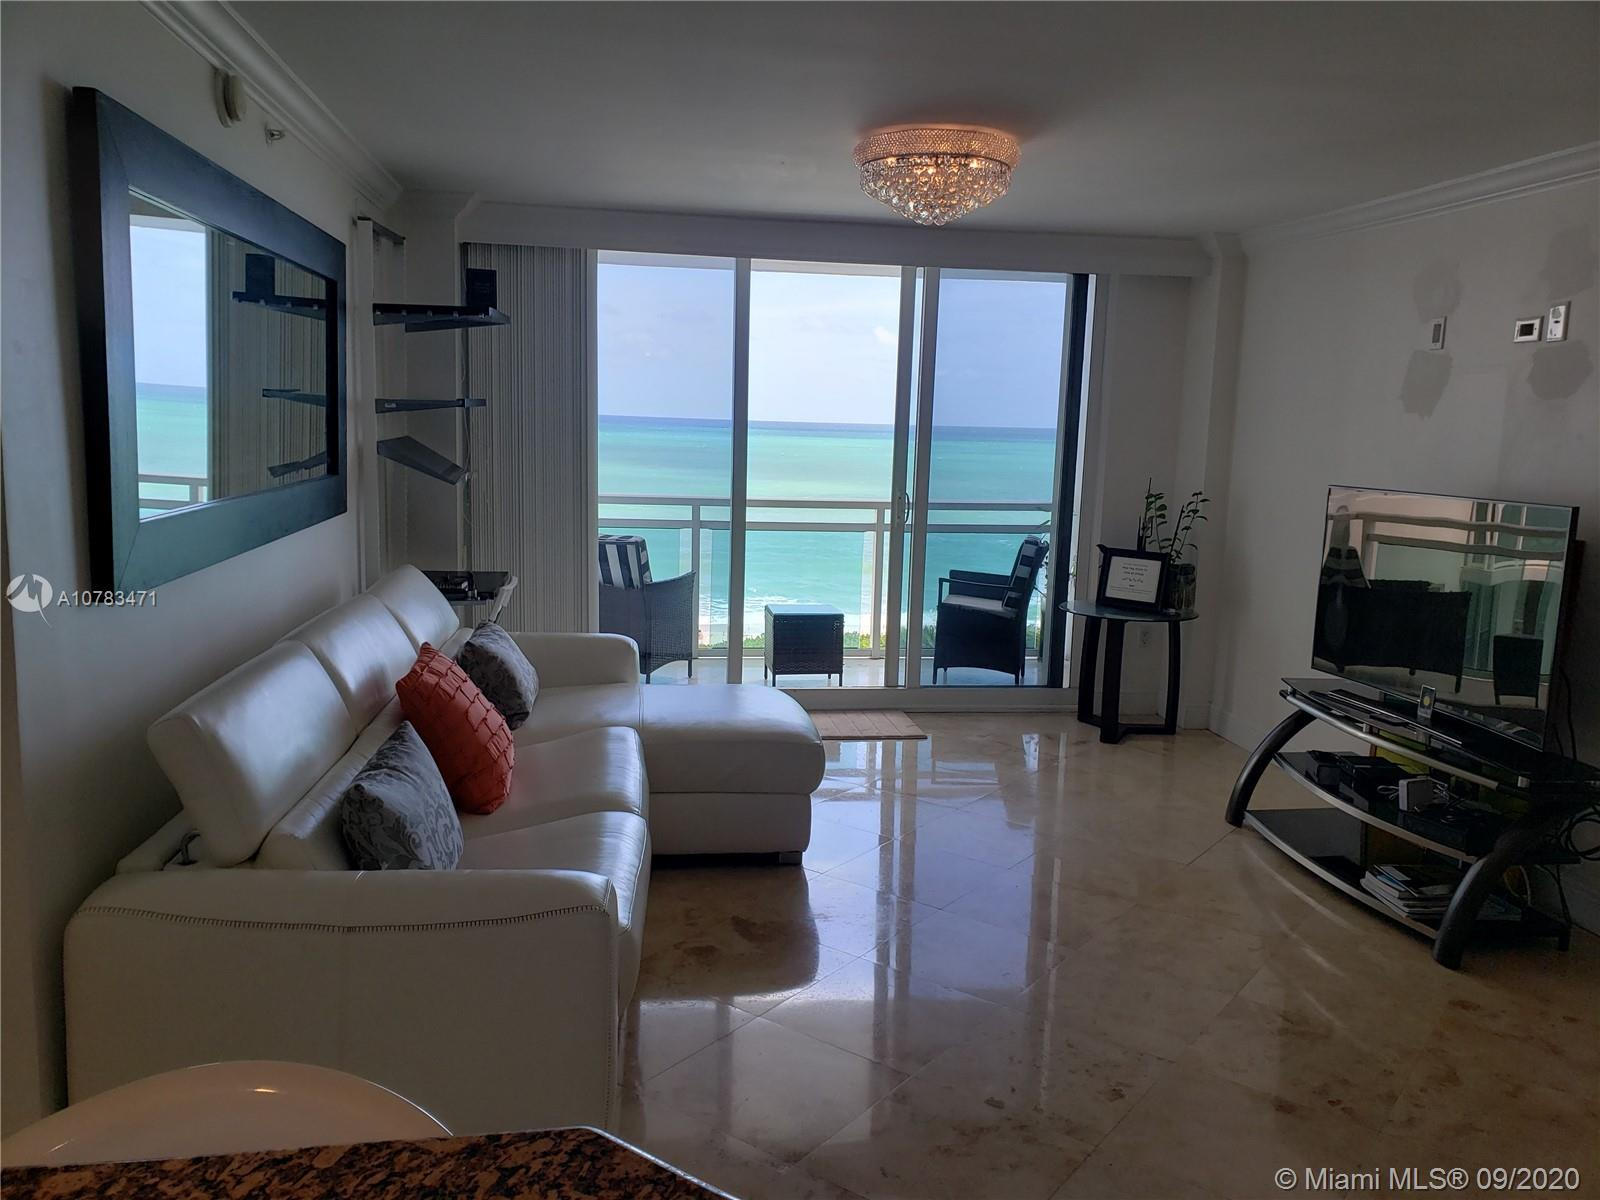 Breathtaking direct unobstructed Ocean View from every room. Unique Floorplan 1 Bed + 1 DEN & 1.5 Ba